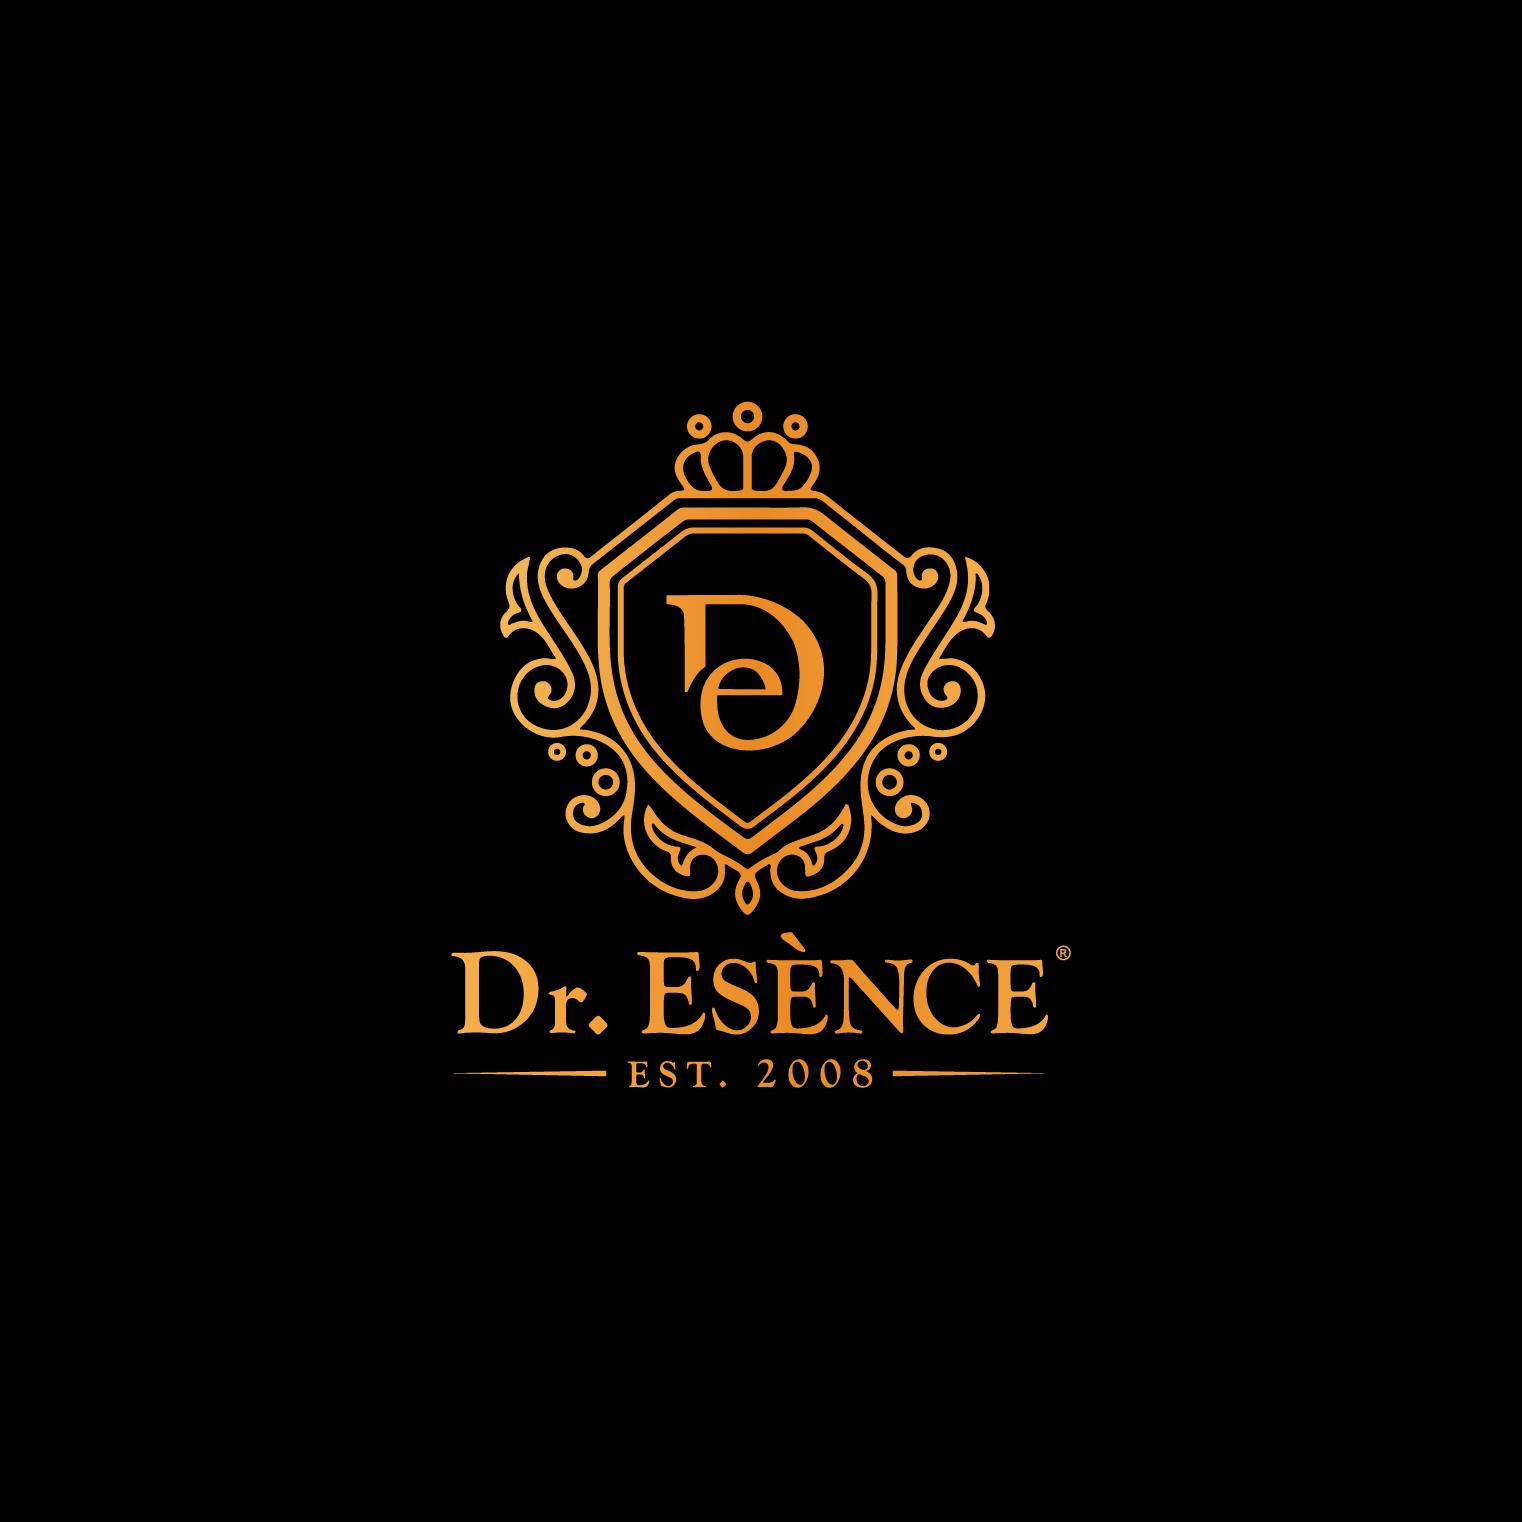 Dr Esence